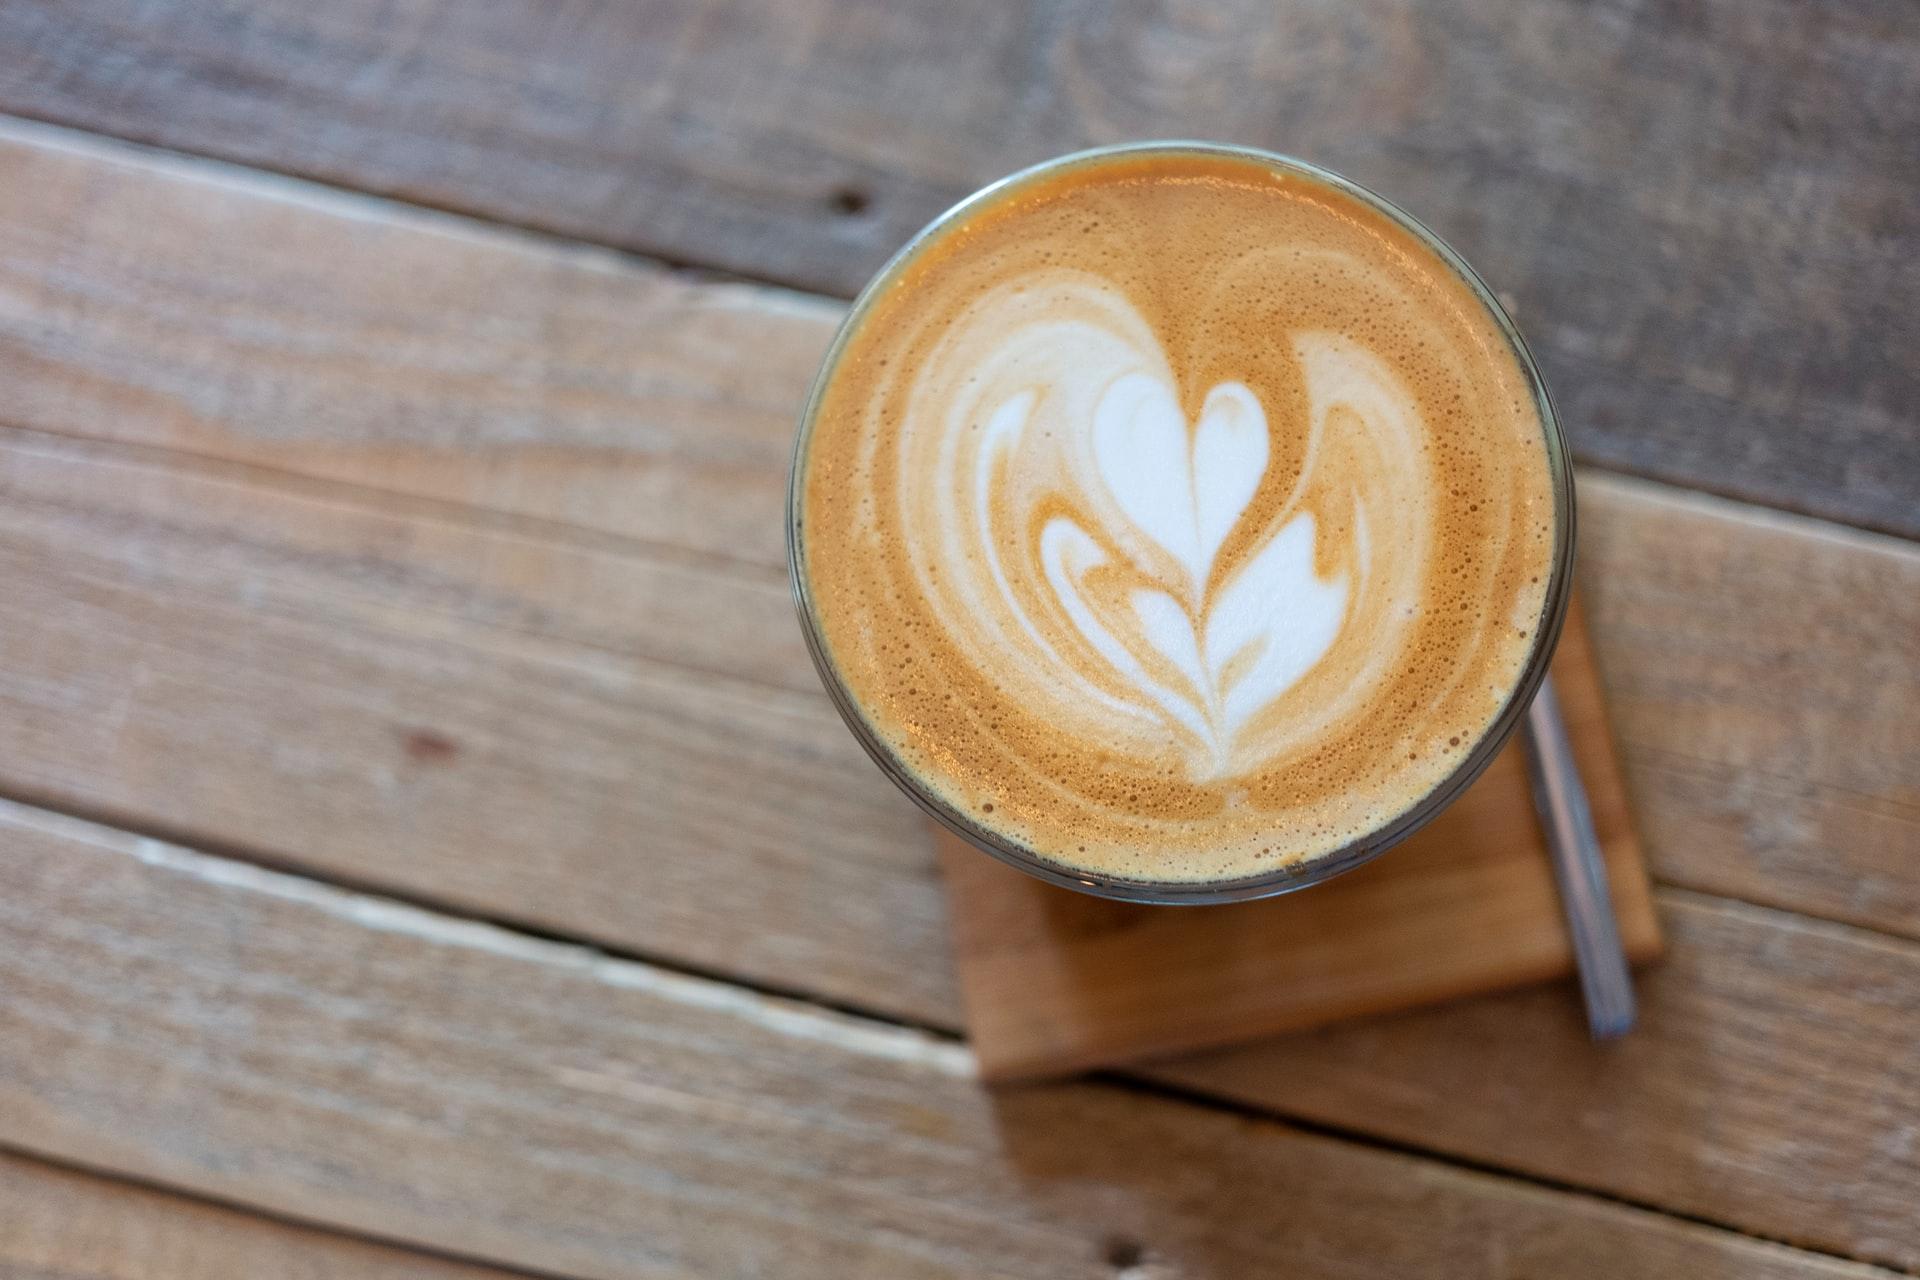 Concord Point Coffee: A Popular Spot for Java in Havre de Grace